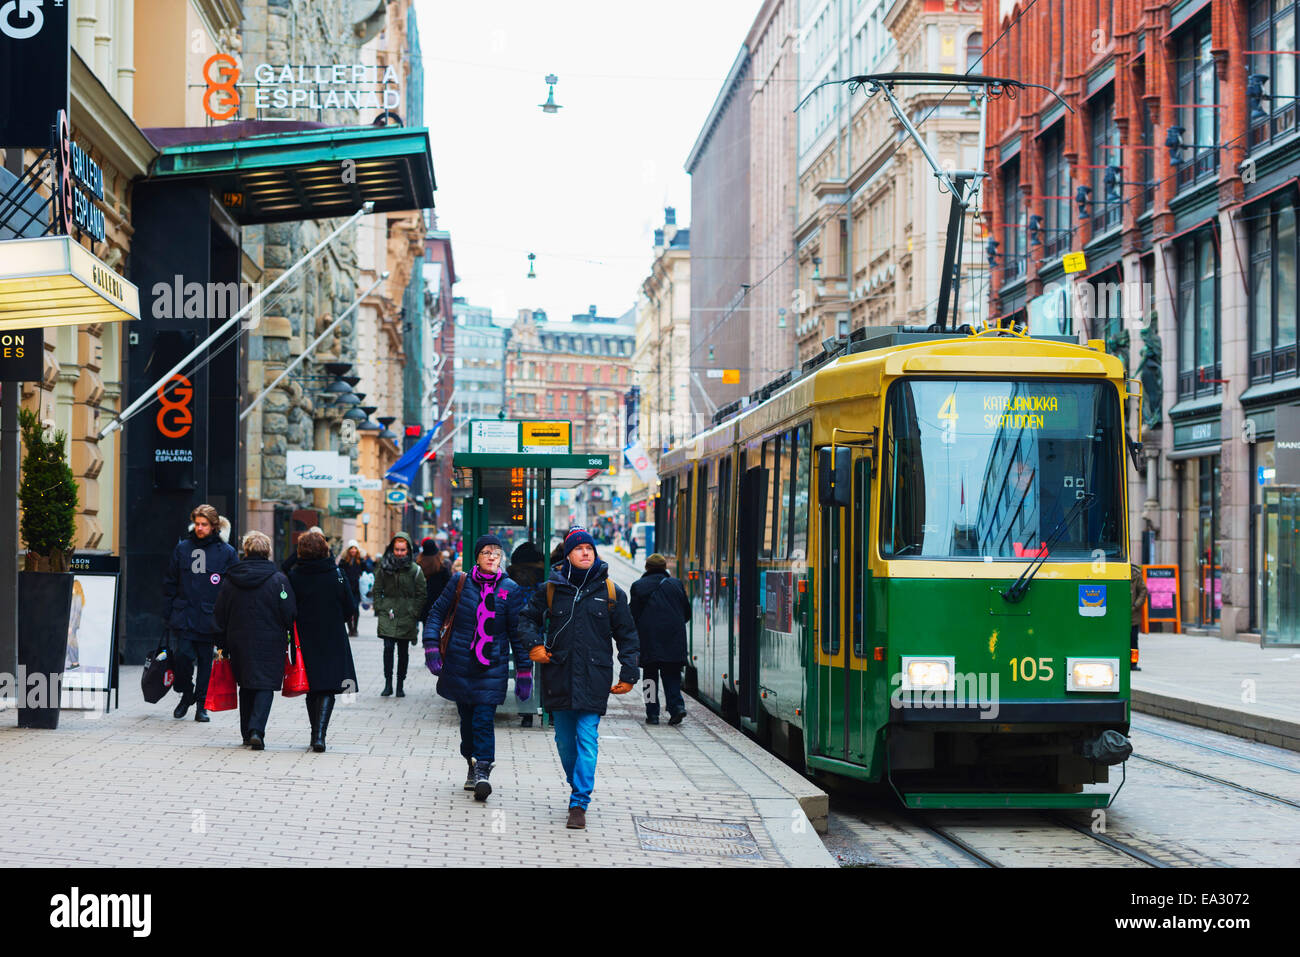 Downtown tram, Helsinki, Finland, Scandinavia, Europe - Stock Image